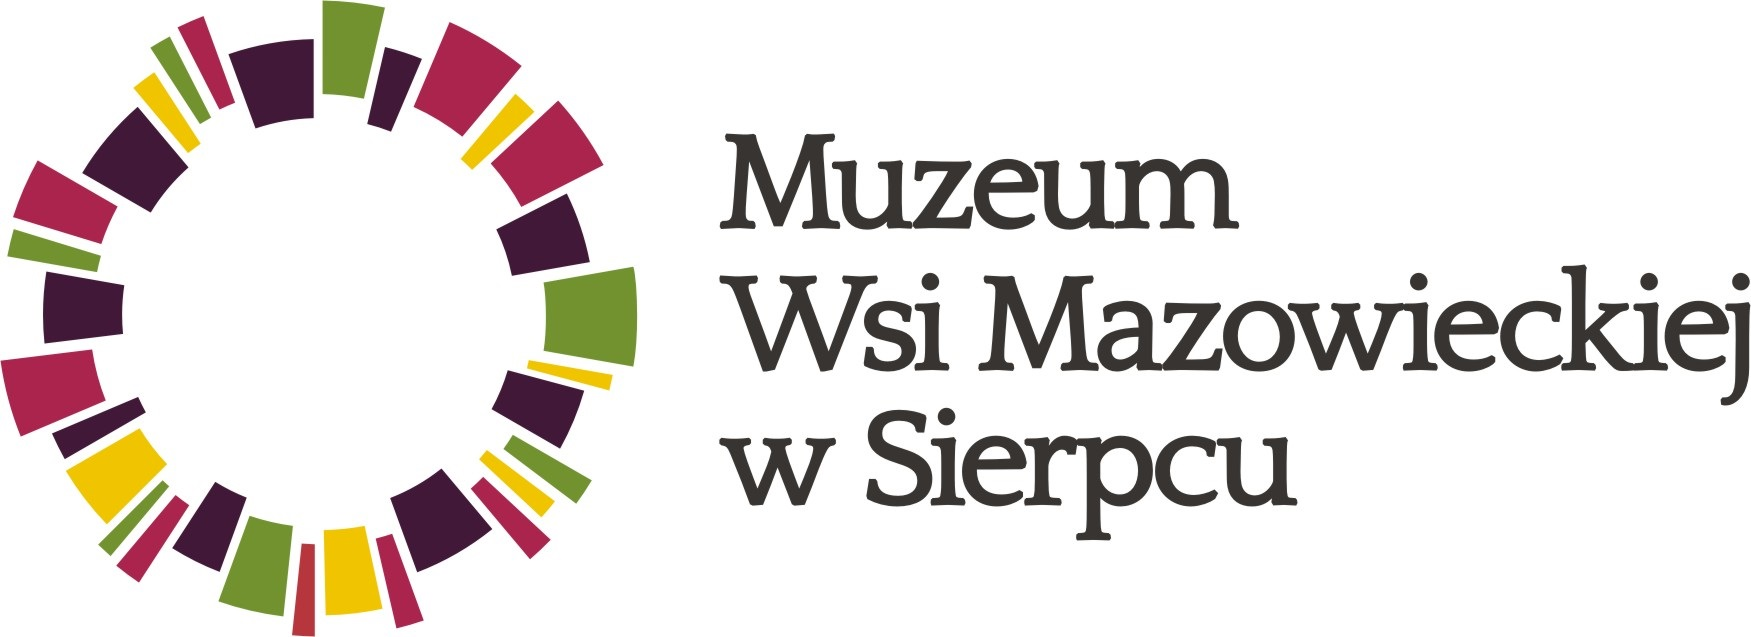 logo_Skansen w Sierpcu